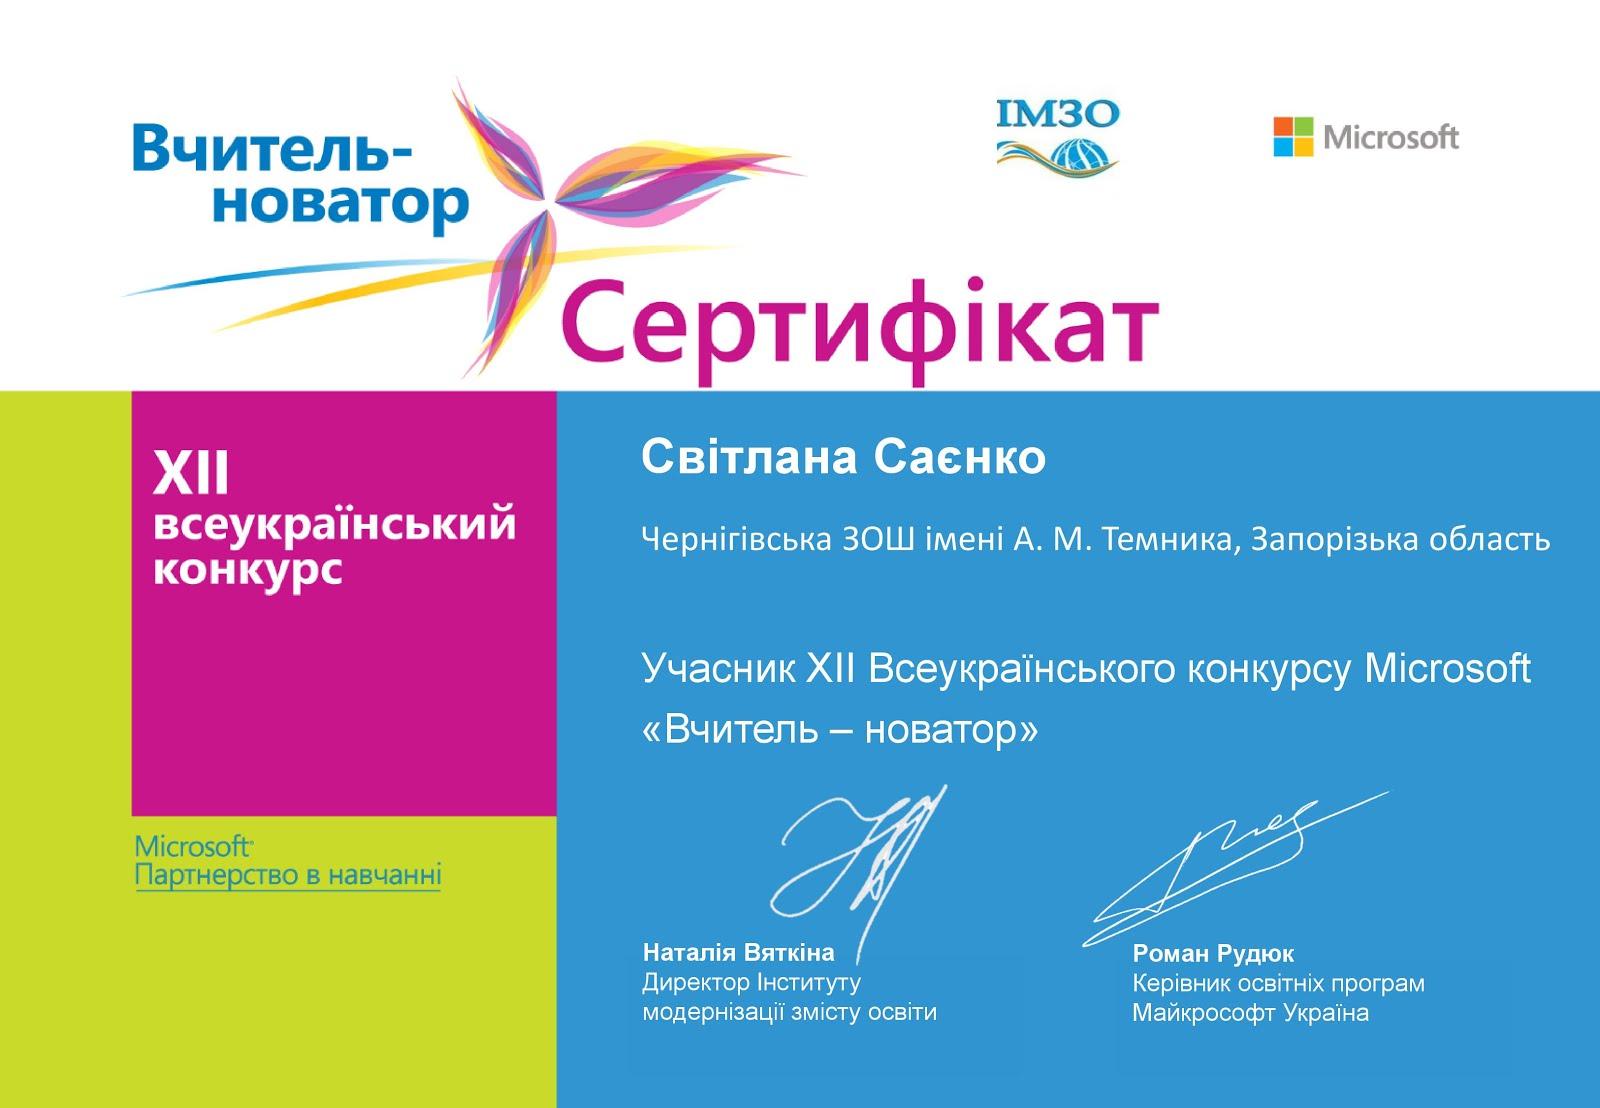 Сертифікат вчитель-новатор